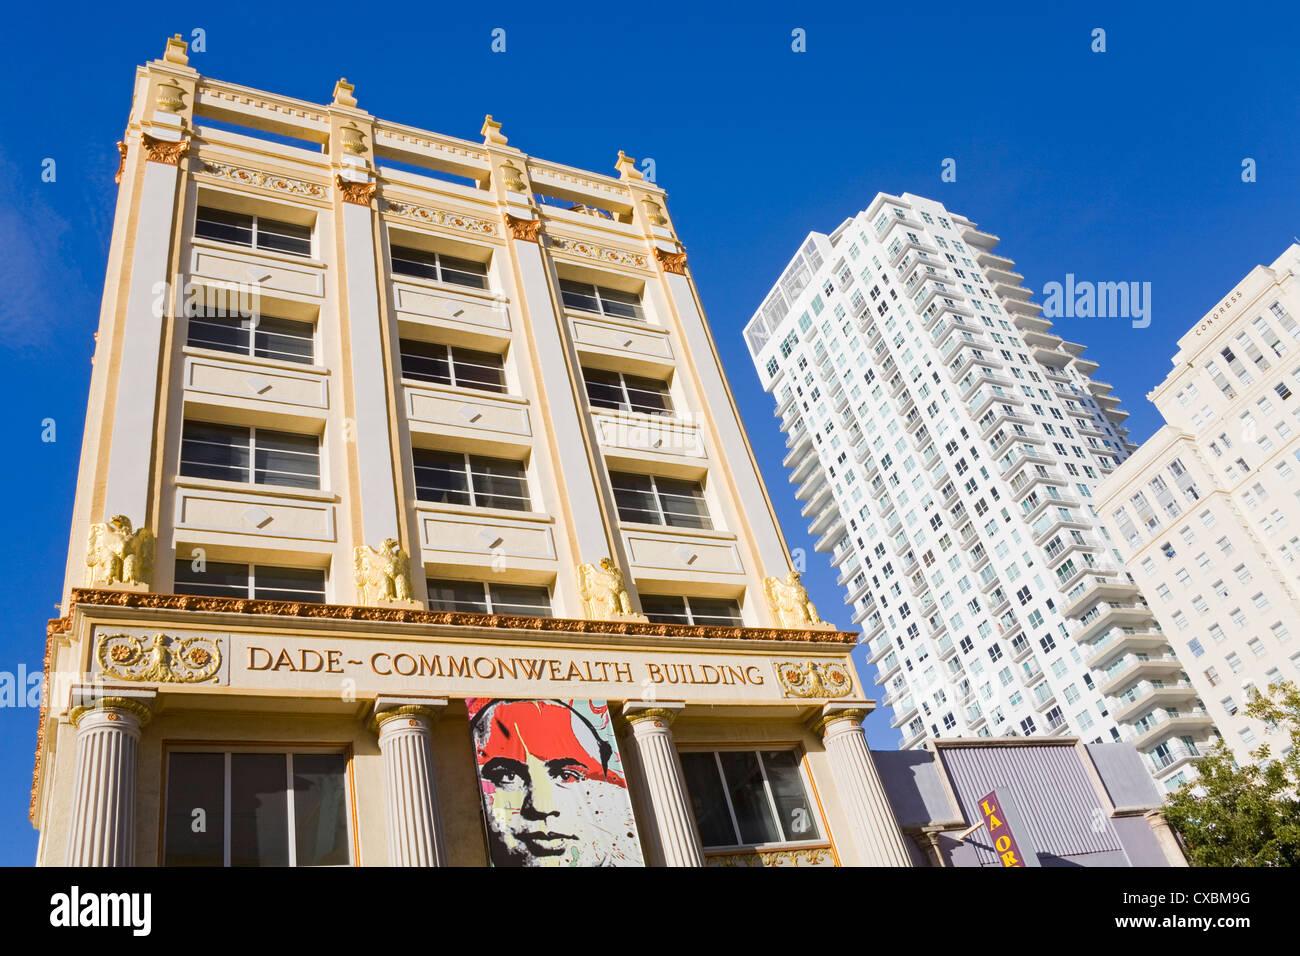 Historic Dade-Commonwealth Building, Miami, Florida, United States of America, North America - Stock Image